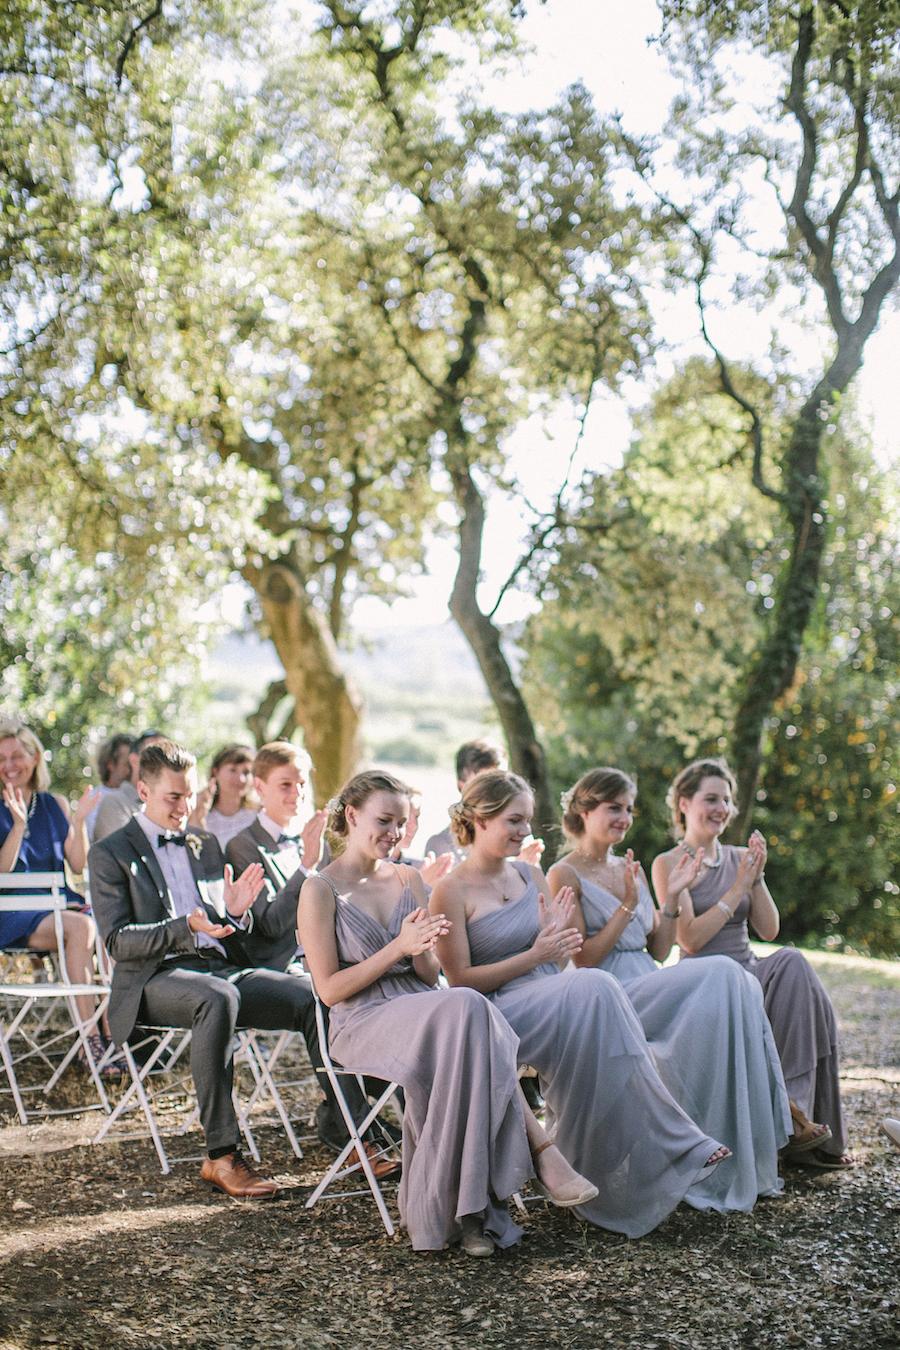 saya-photography-rustic-french-wedding-provence-domaines-de-patras-76.jpg